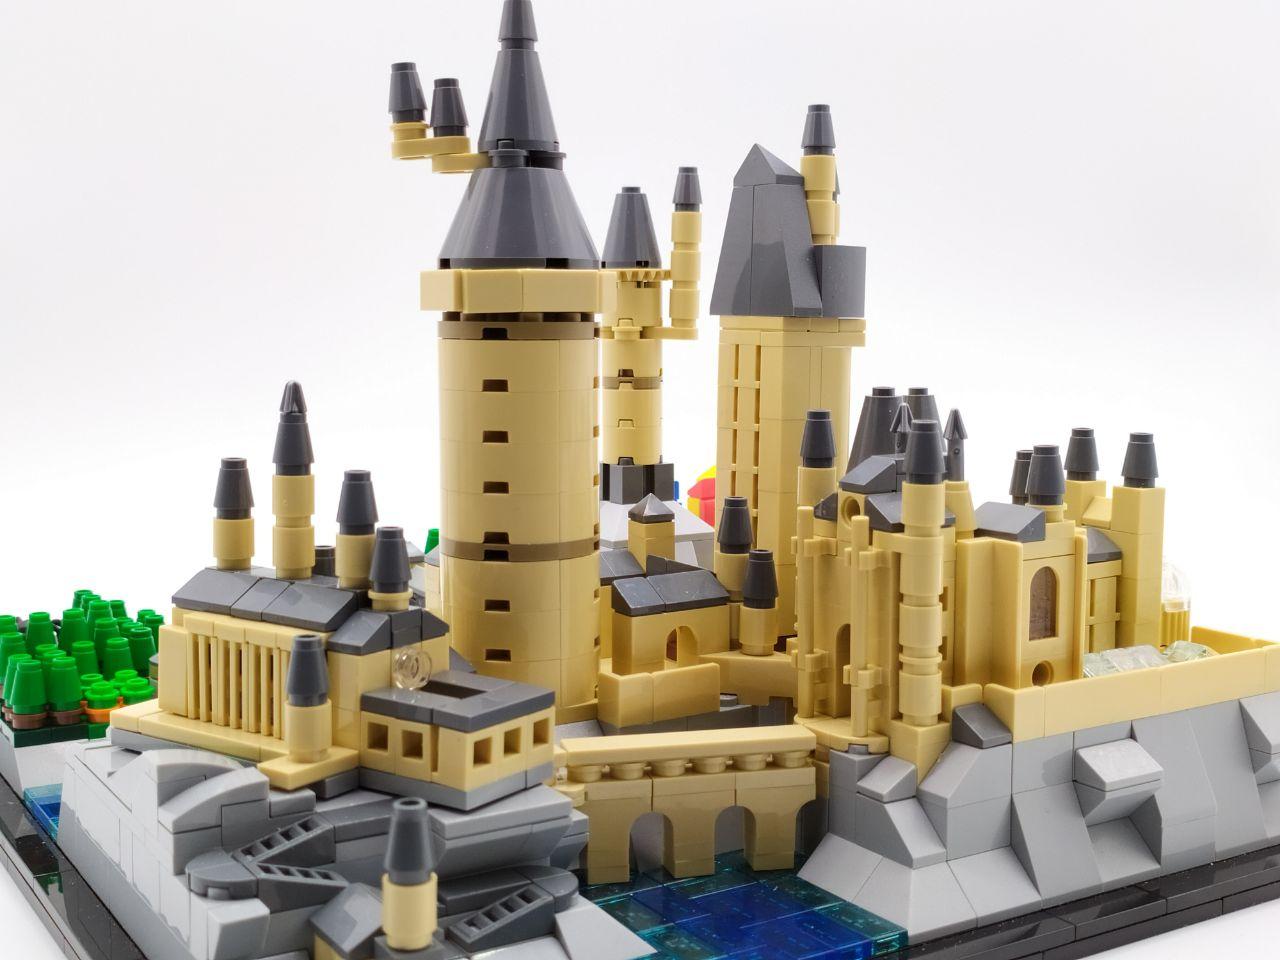 lego kit Hogwarts caslte